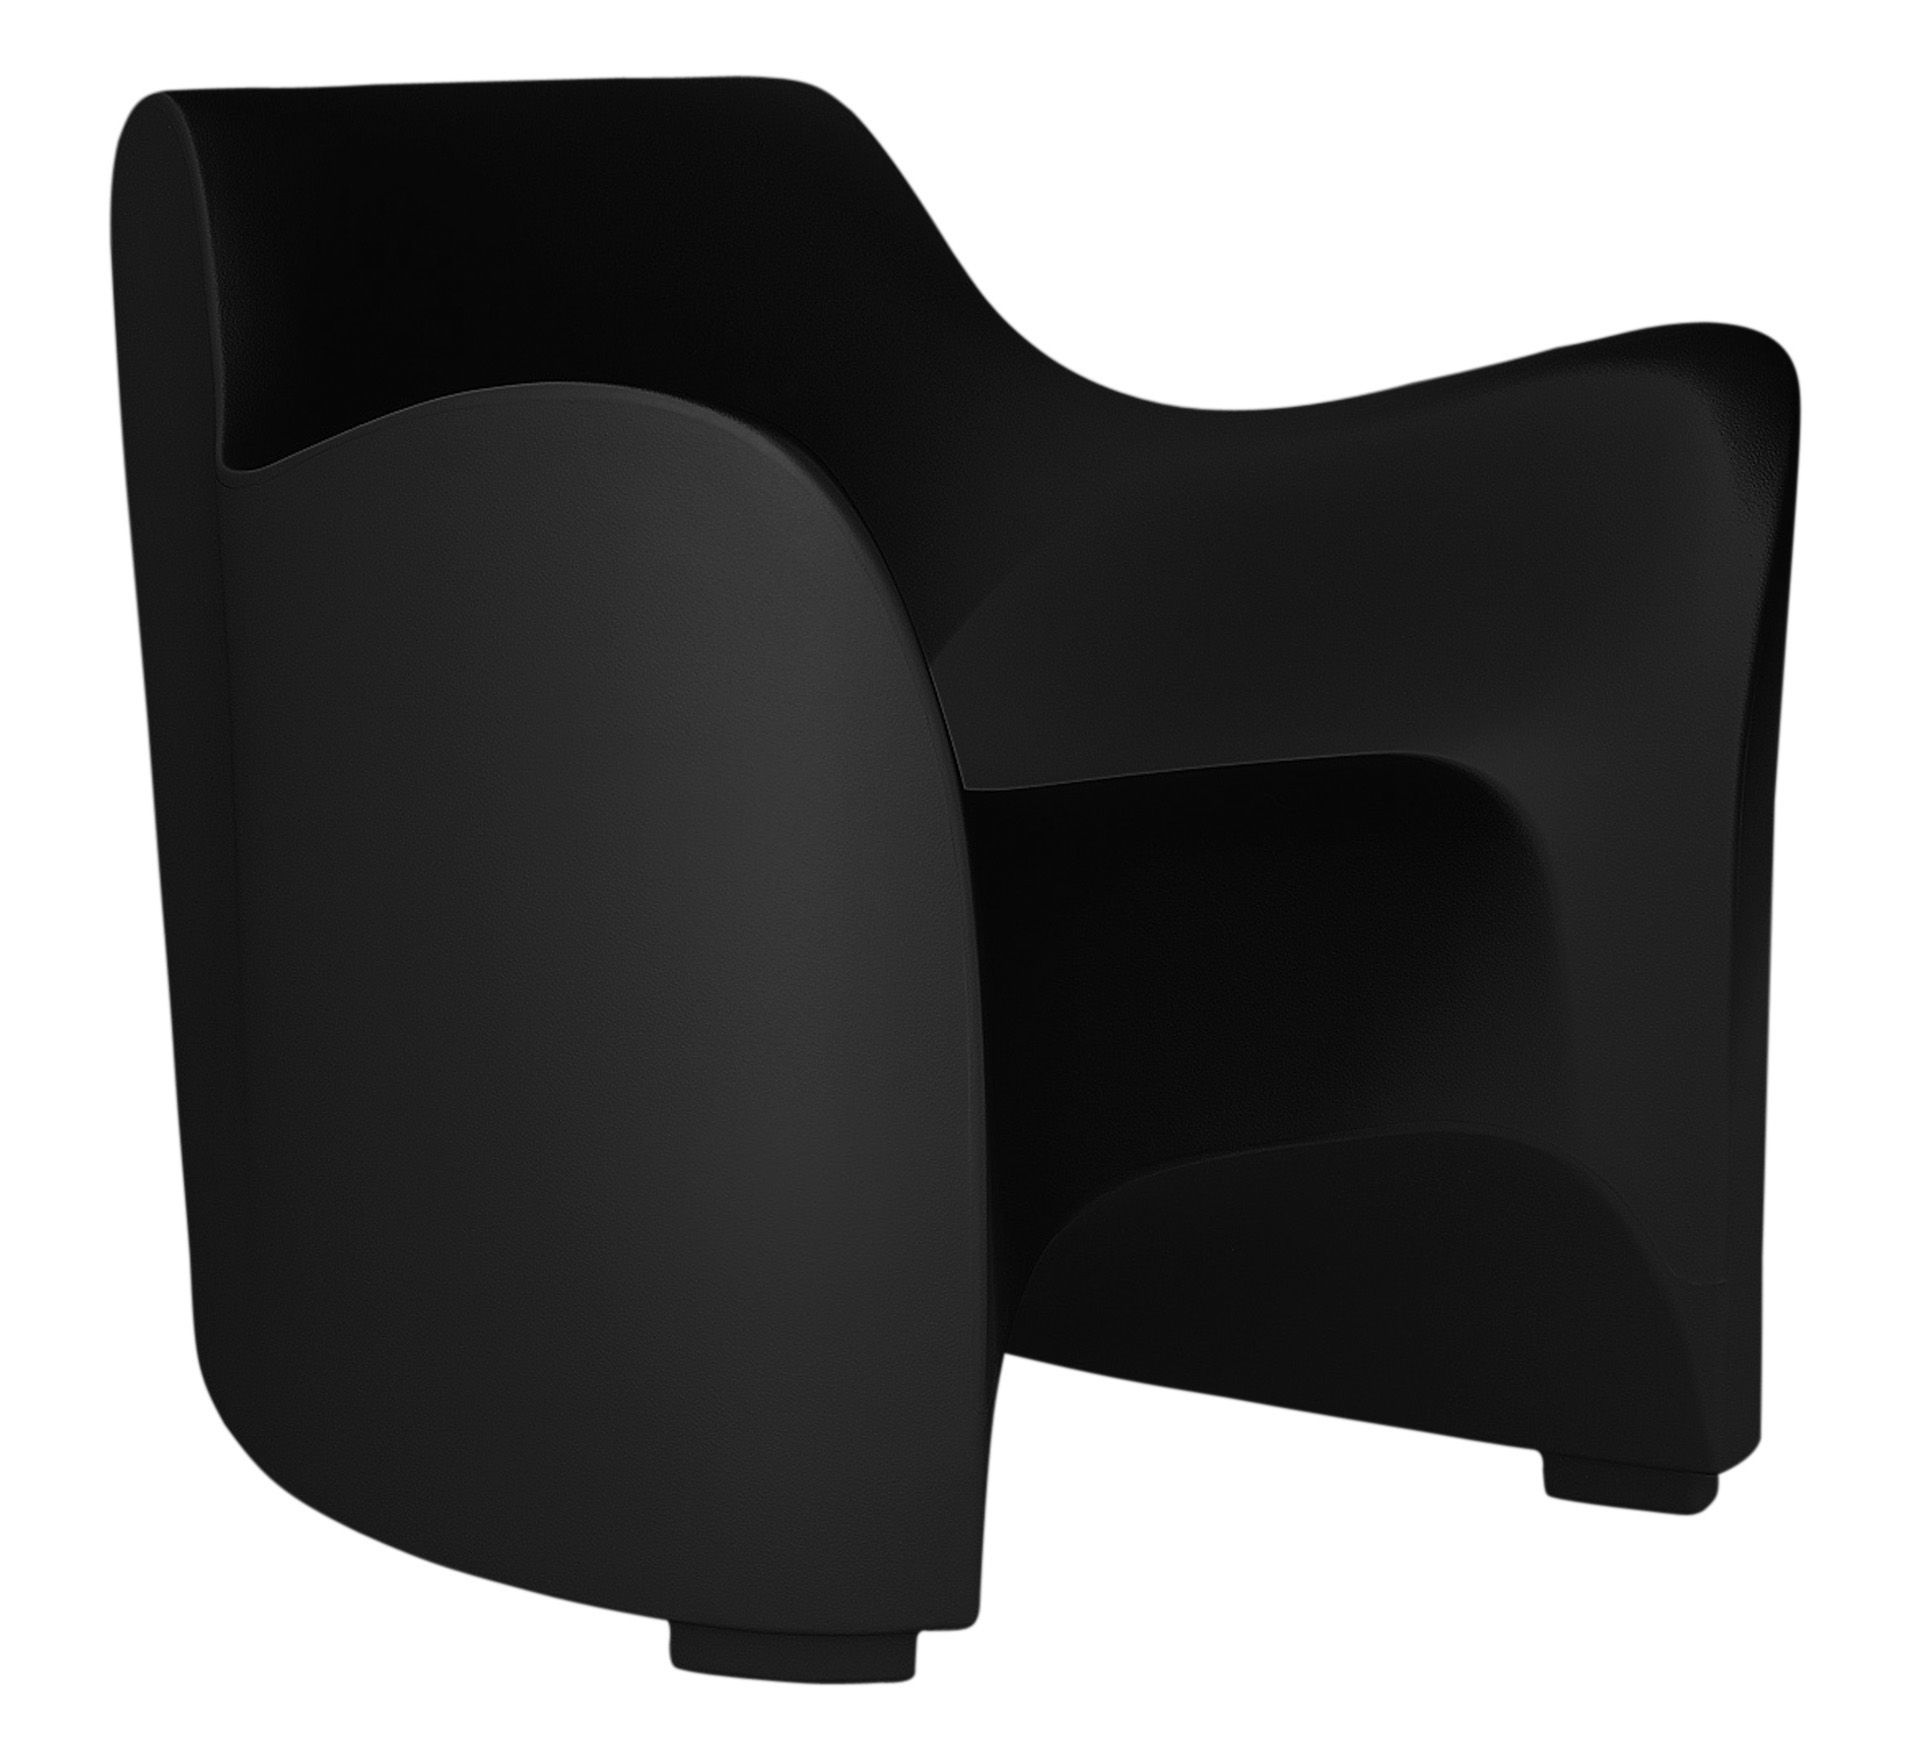 Möbel - Lounge Sessel - Tokyo Pop Sessel - Driade - schwarz - Polyäthylen